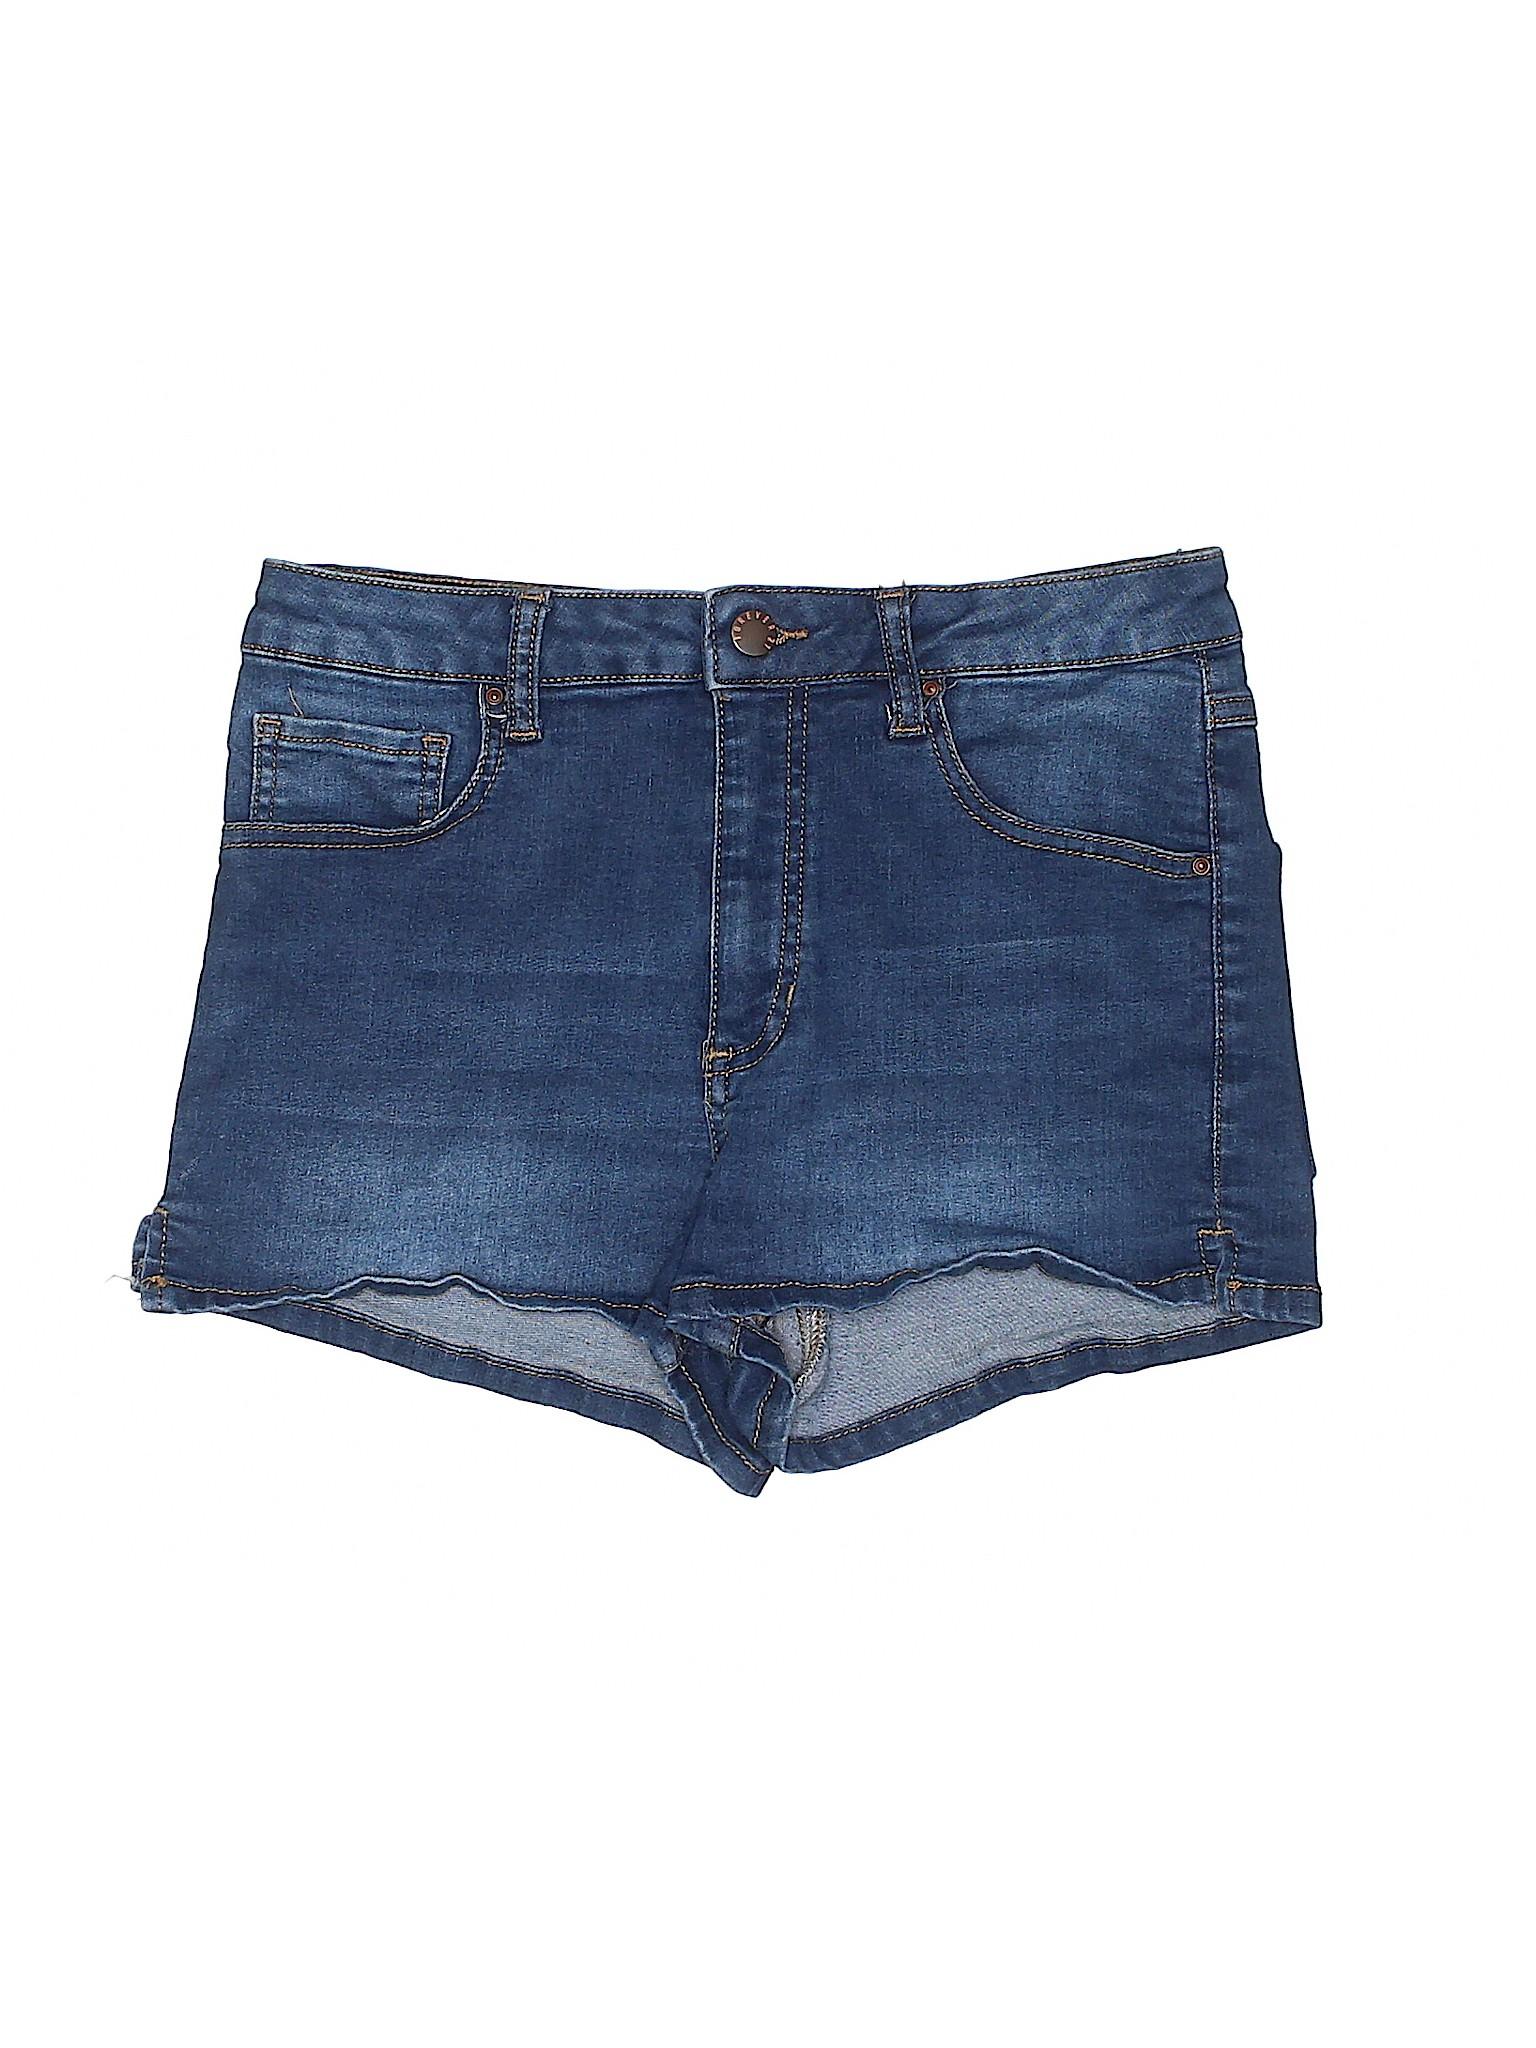 Denim Boutique Shorts Boutique 21 Forever Forever Denim 21 w7vqFxOF